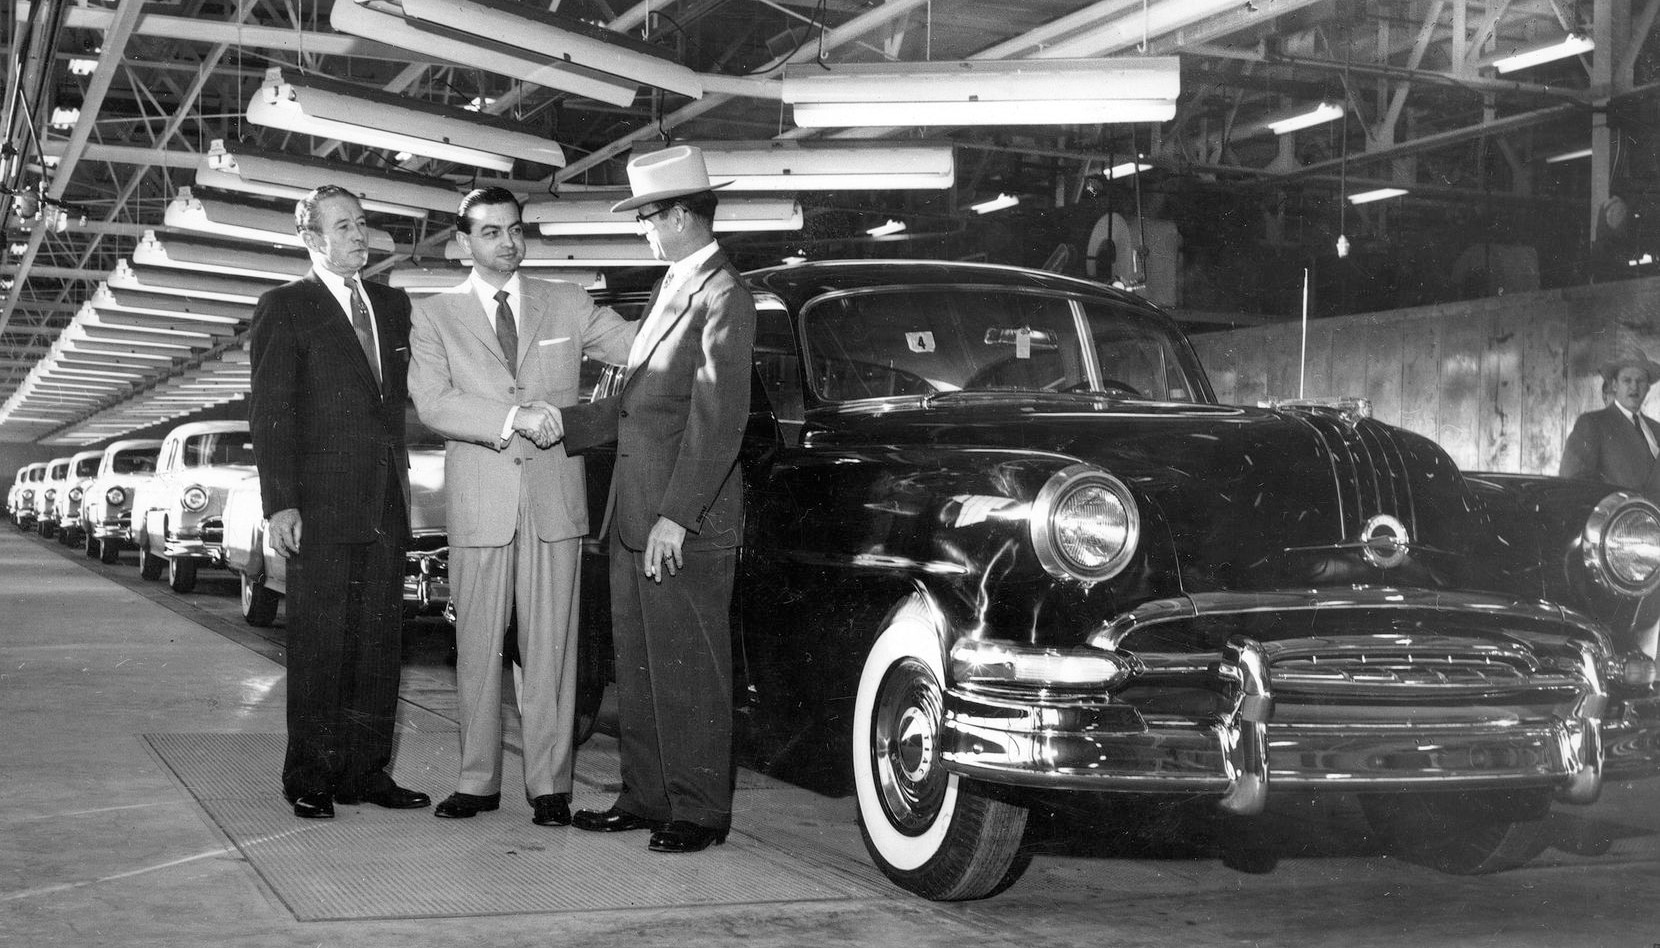 Tom Vandergriff (center), mayor of Arlington, with J.L. Conlon of General Motors and E.C. Klotzburger, General Motors plant manager, with first car off assembly line at General Motors Arlington plant, 01/06/1954.